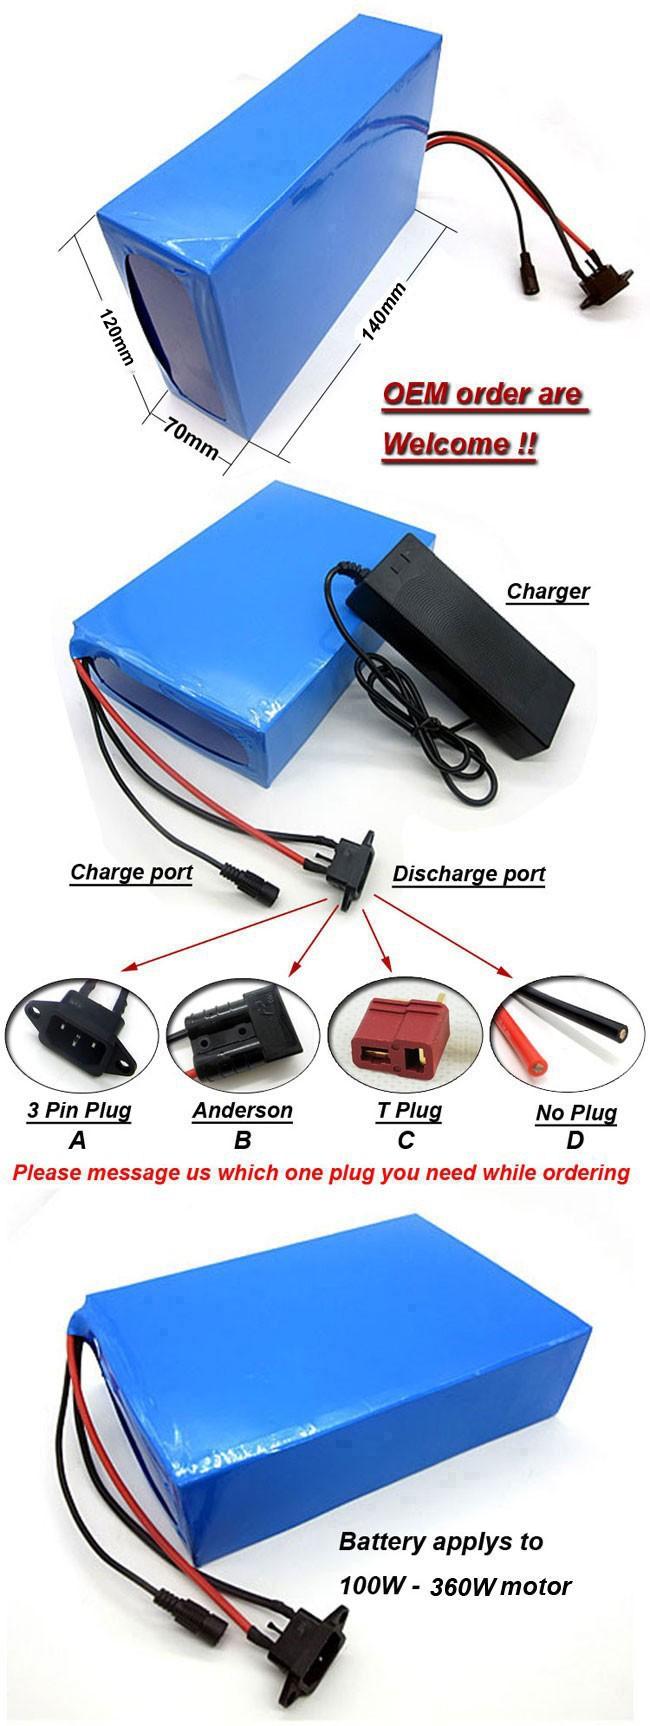 Зарядное устройство своими руками на аккумулятор 24 вольта